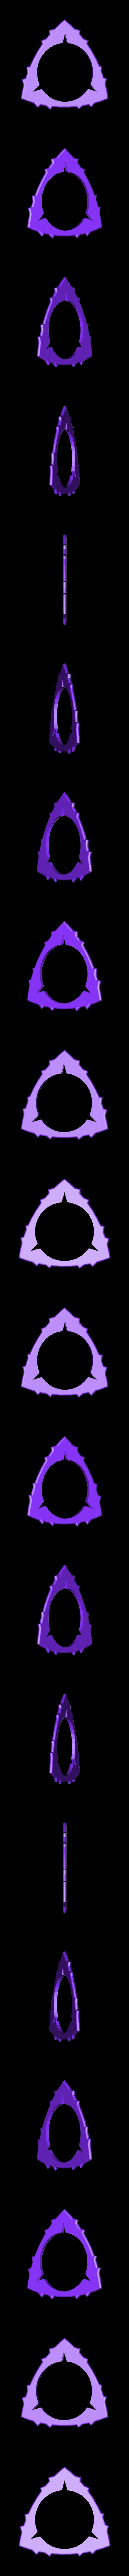 Triangle-Dent Flex-centerTriangle'Curve 06.stl Download free STL file Triangle-Dent Flex-centerTriangle'Curve • 3D printing object, carleslluisar